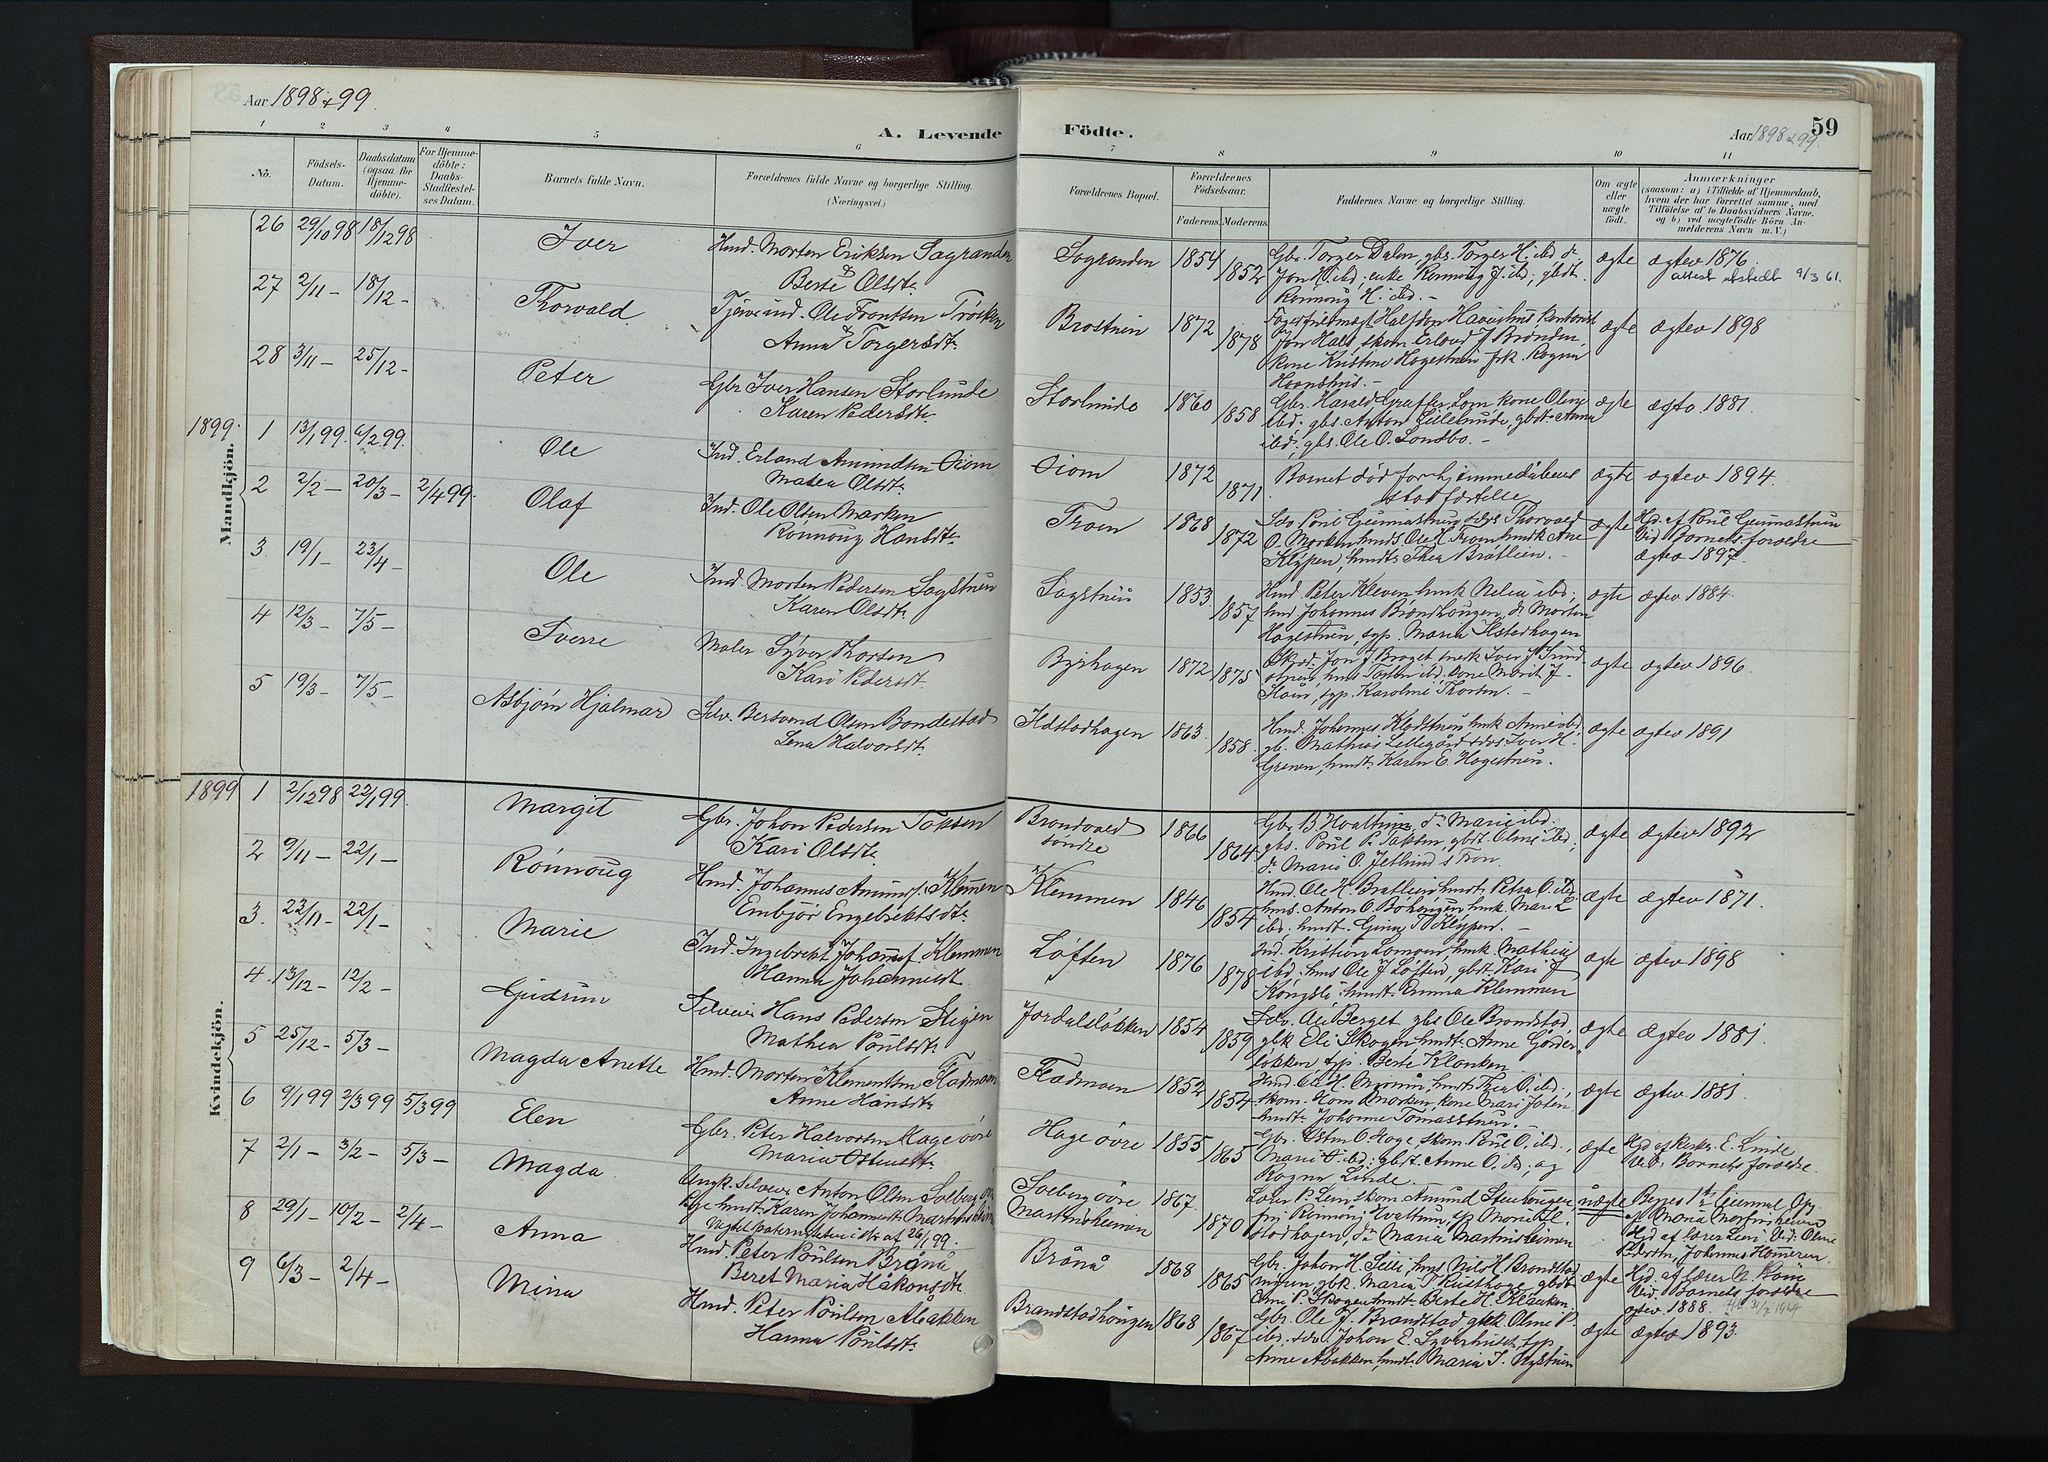 SAH, Nord-Fron prestekontor, Ministerialbok nr. 4, 1884-1914, s. 59